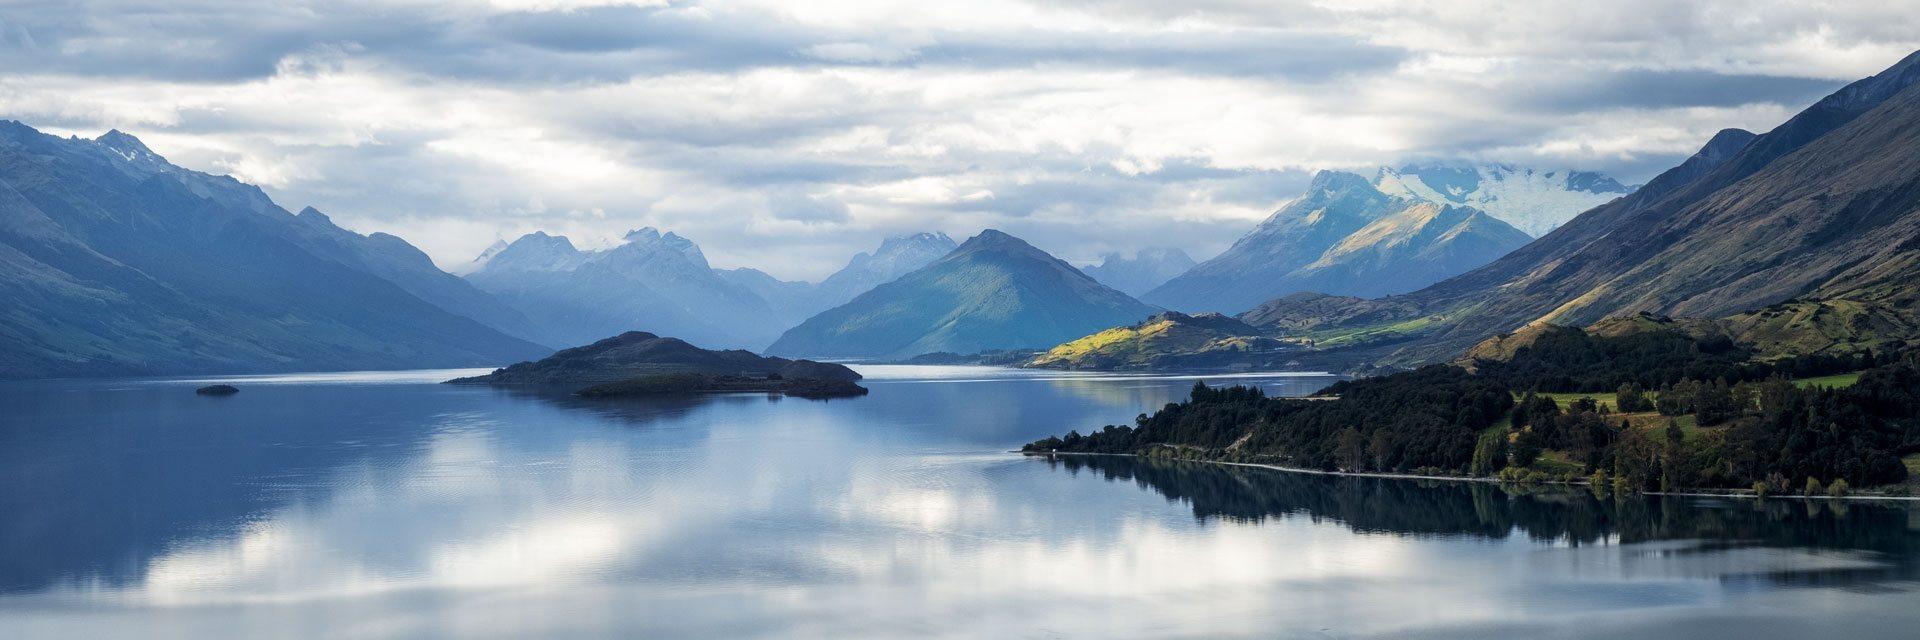 Thomas Menk VNew Zealand